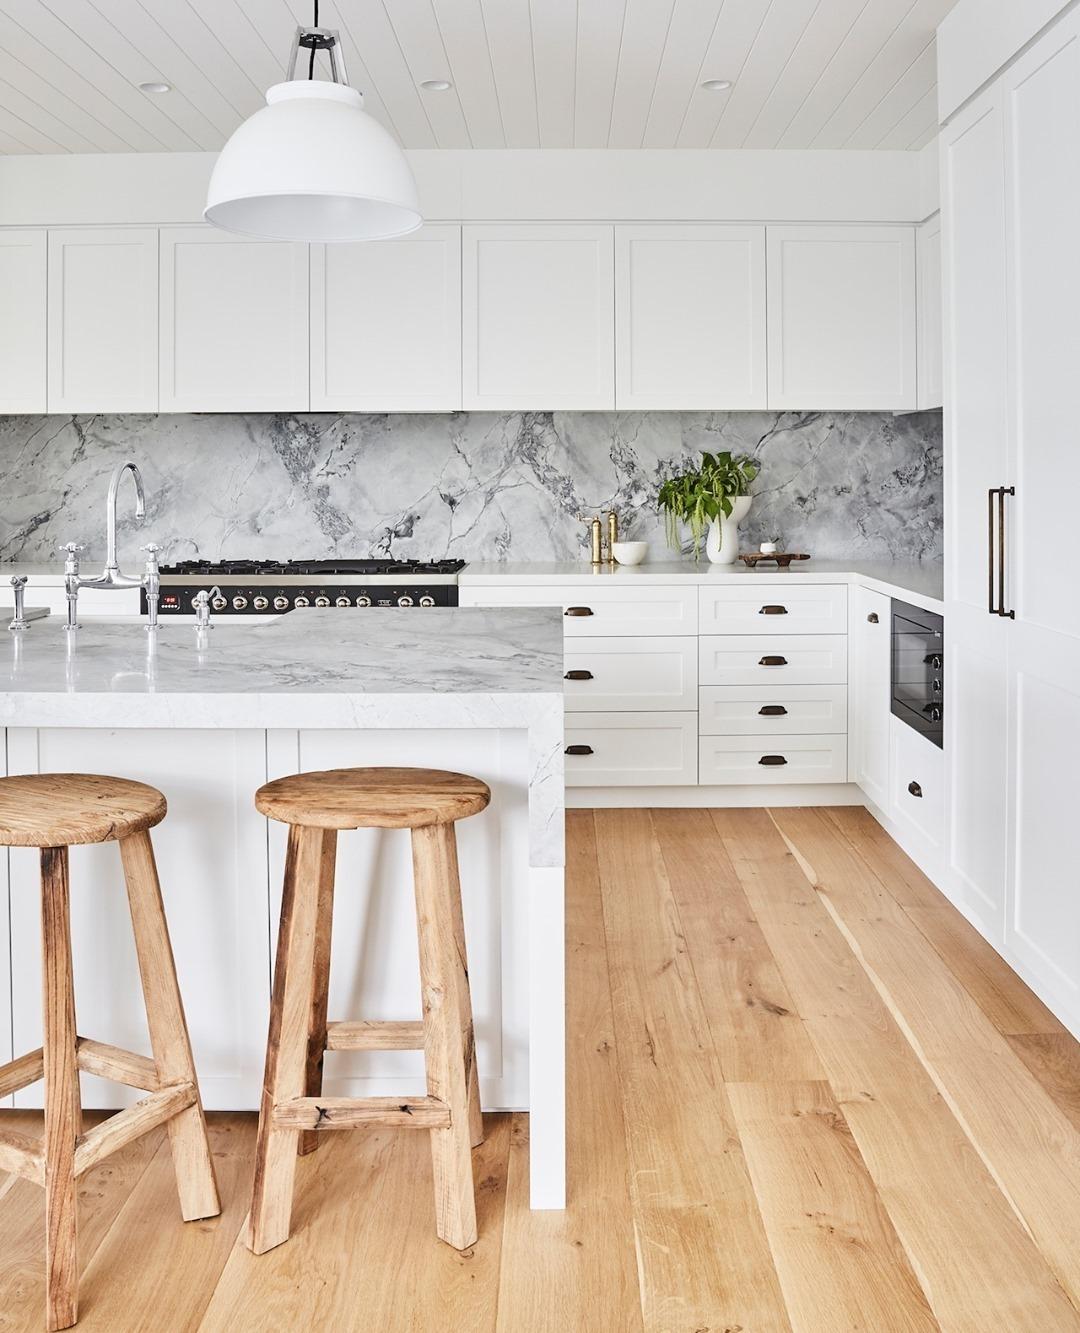 Honey-toned flooring and a stone backspl...